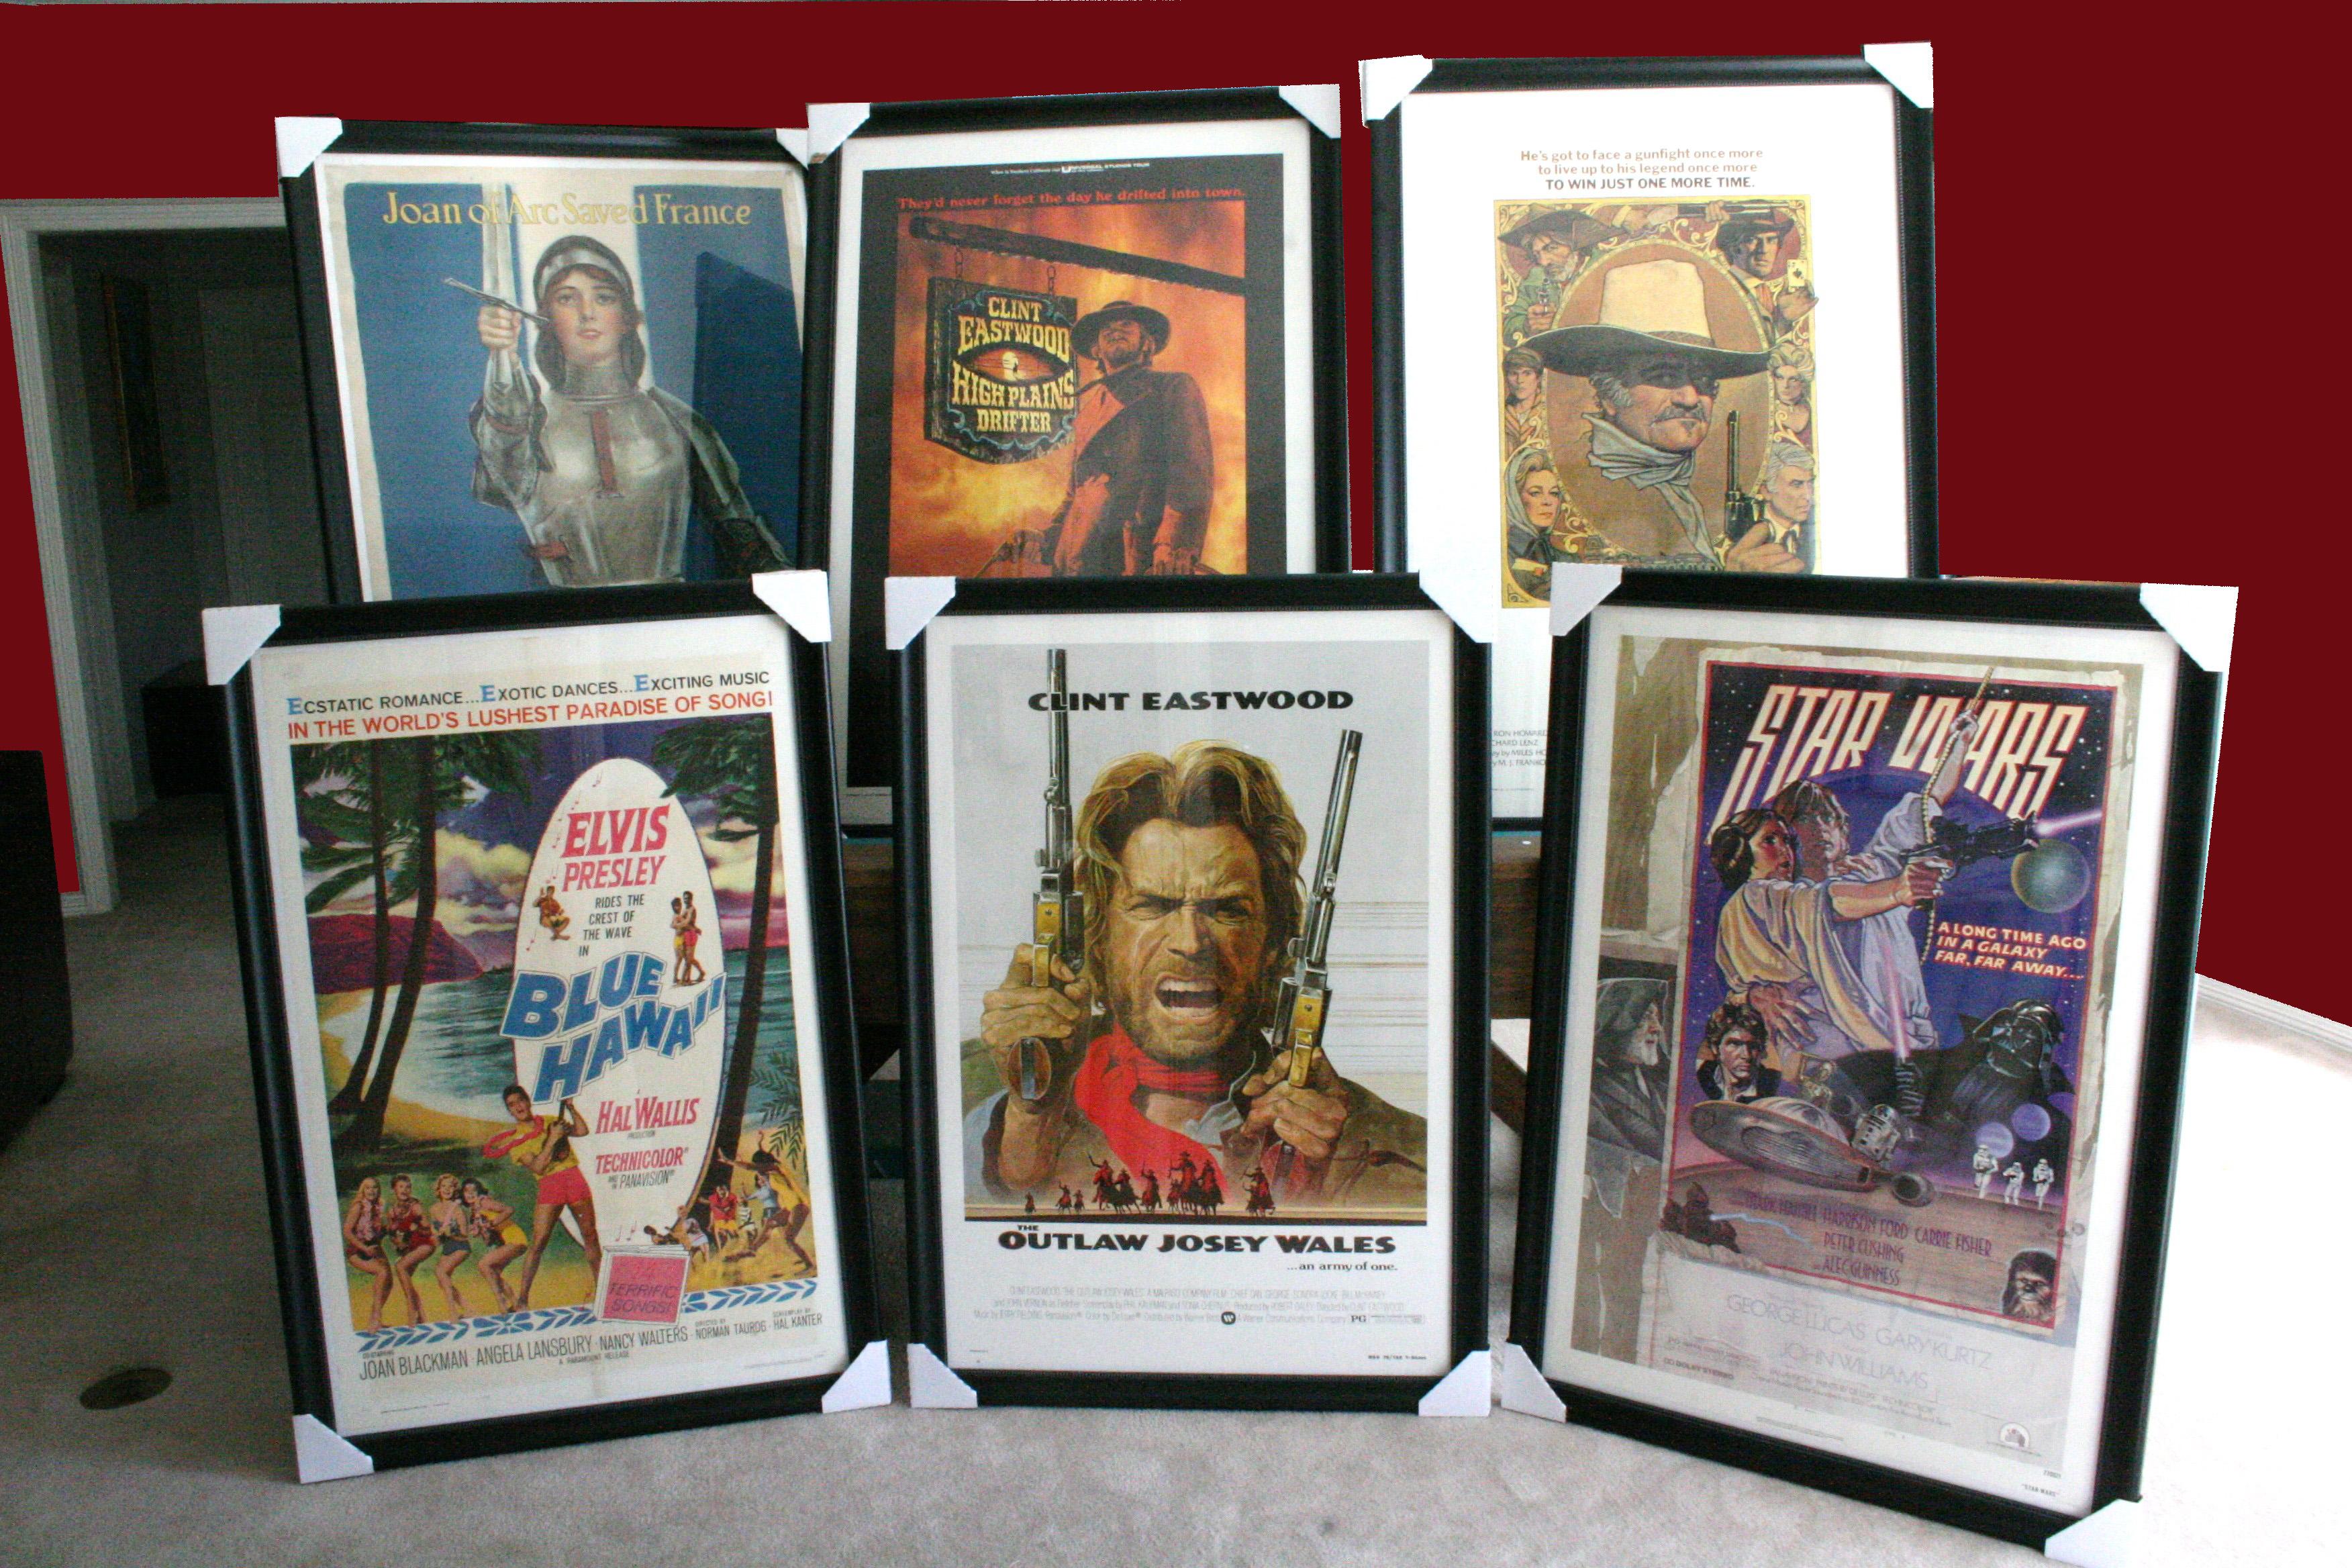 we specialize in framing original vintage posters